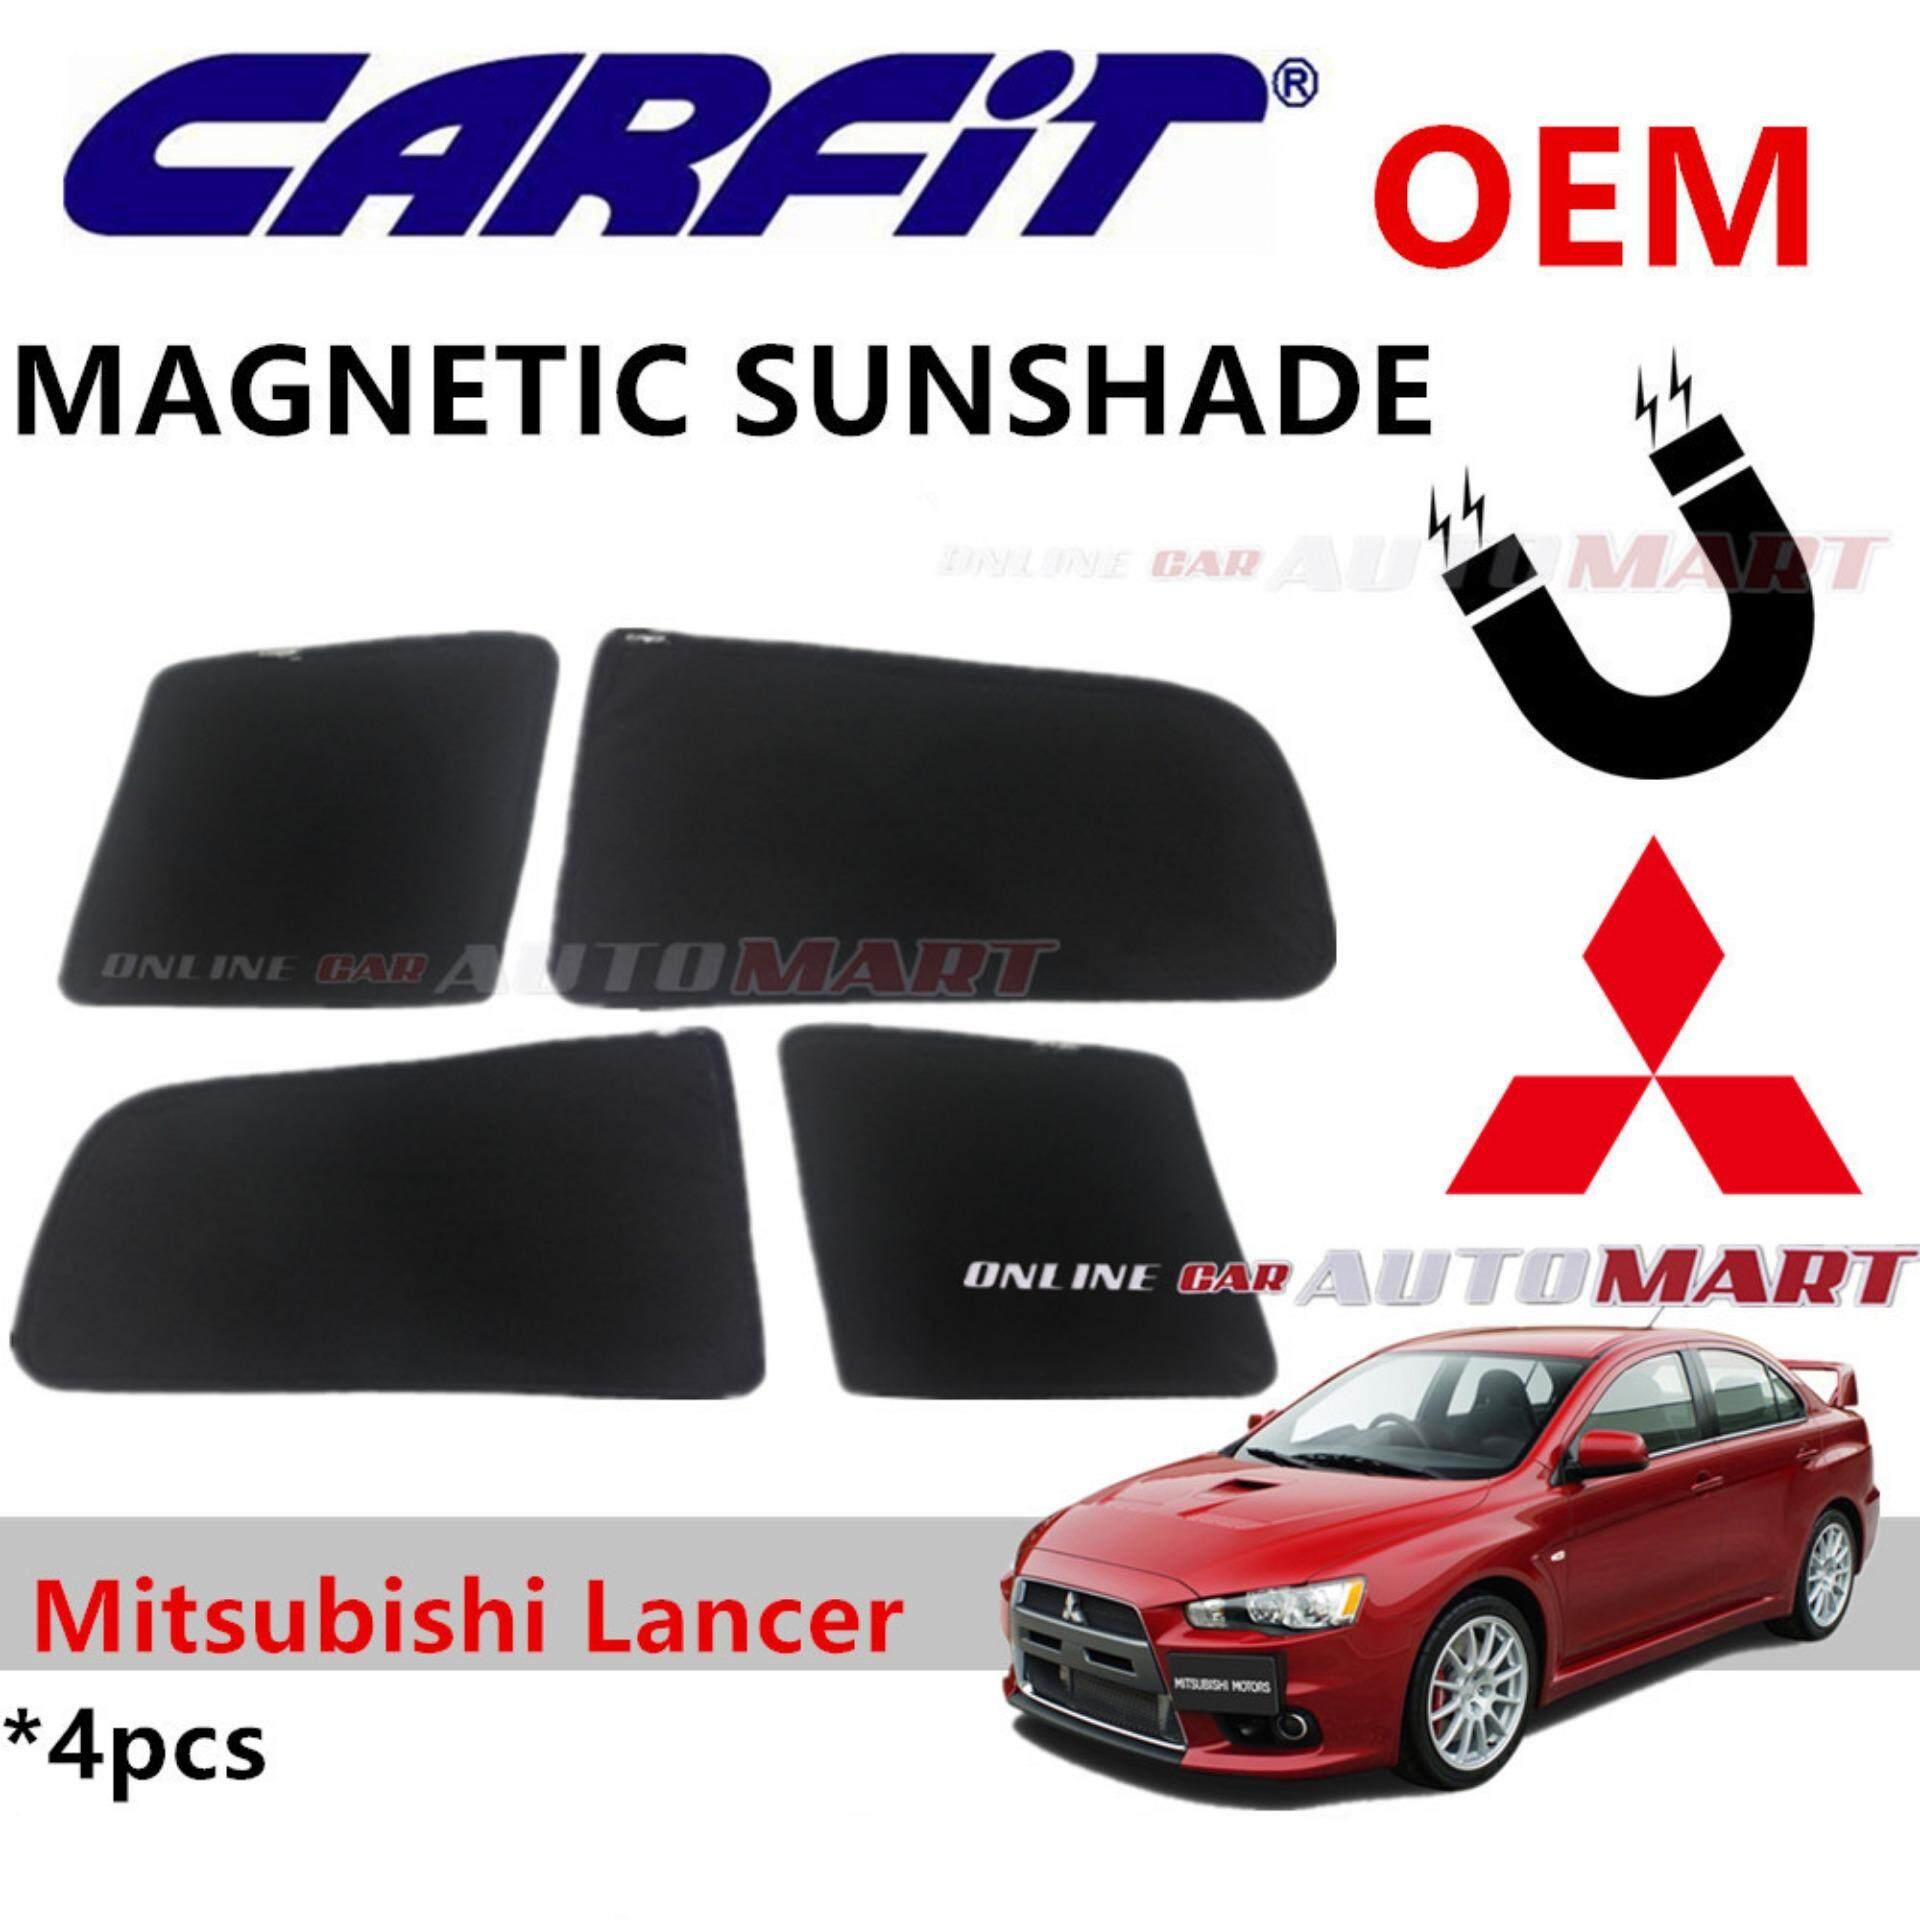 CARFIT OEM Magnetic Custom Fit Sunshade For Mitsubishi Lancer 2007 (4pcs Sets)